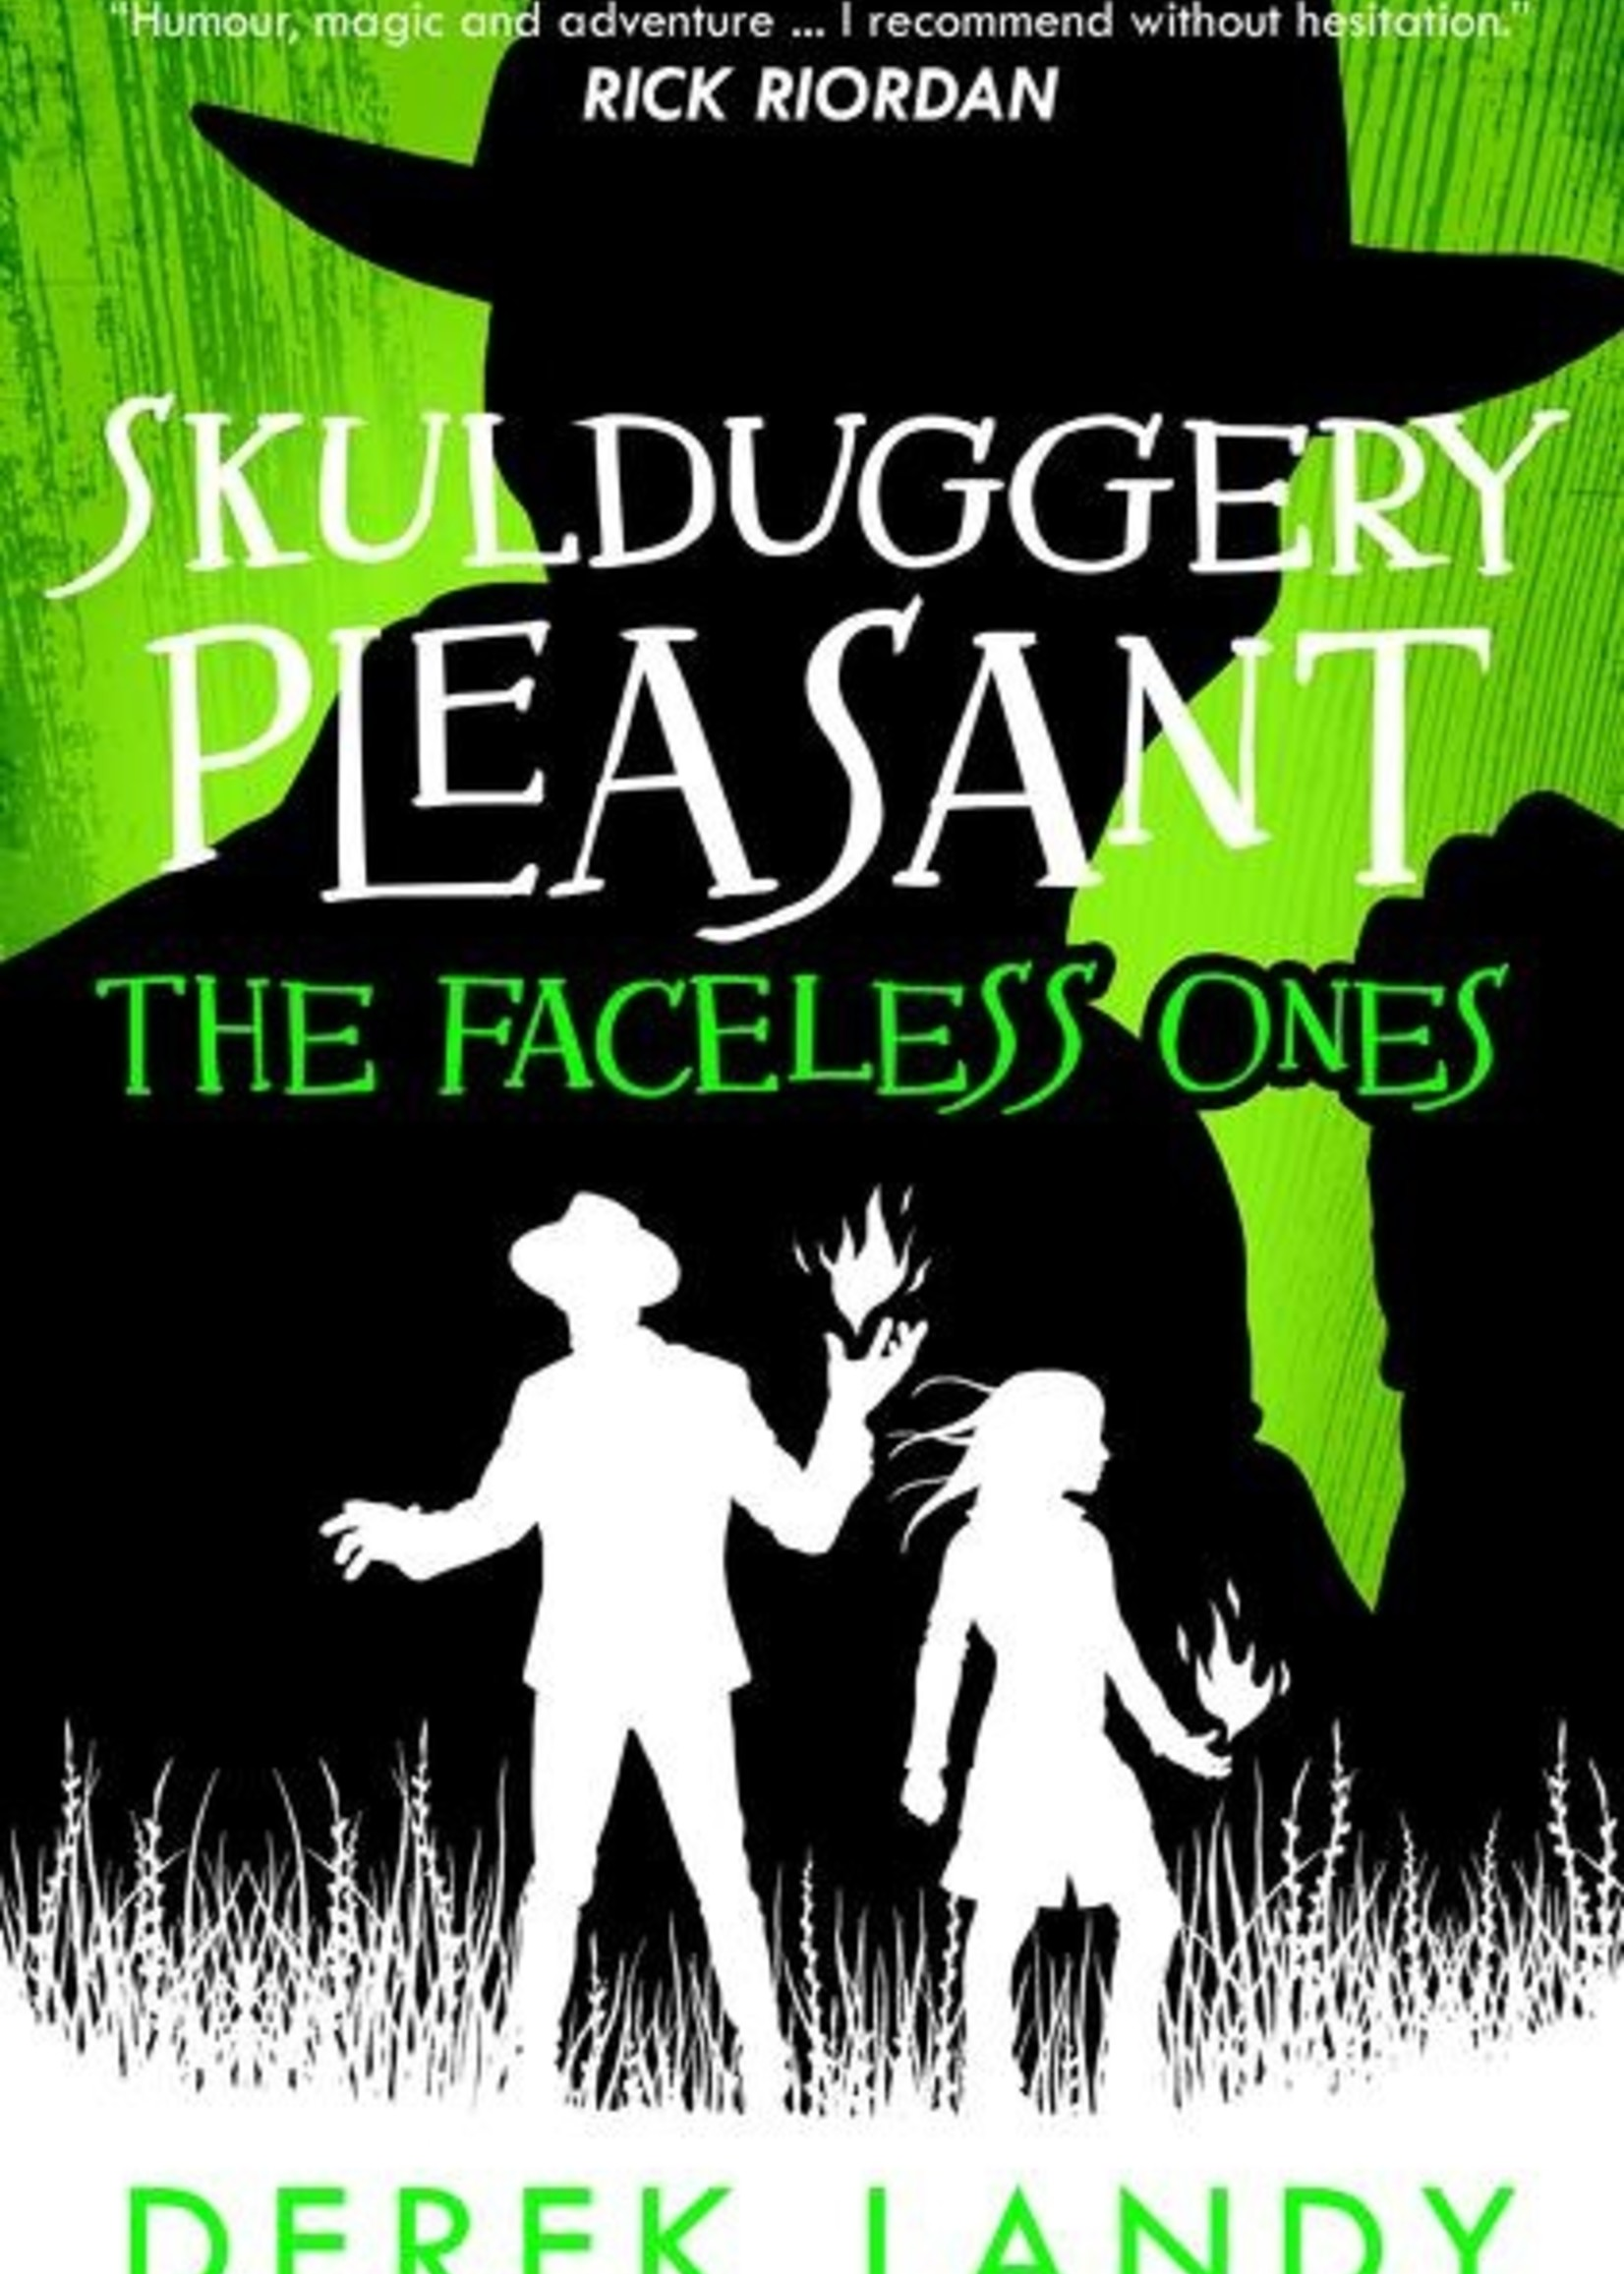 Skulduggery Pleasant #03, The Faceless Ones - Paperback